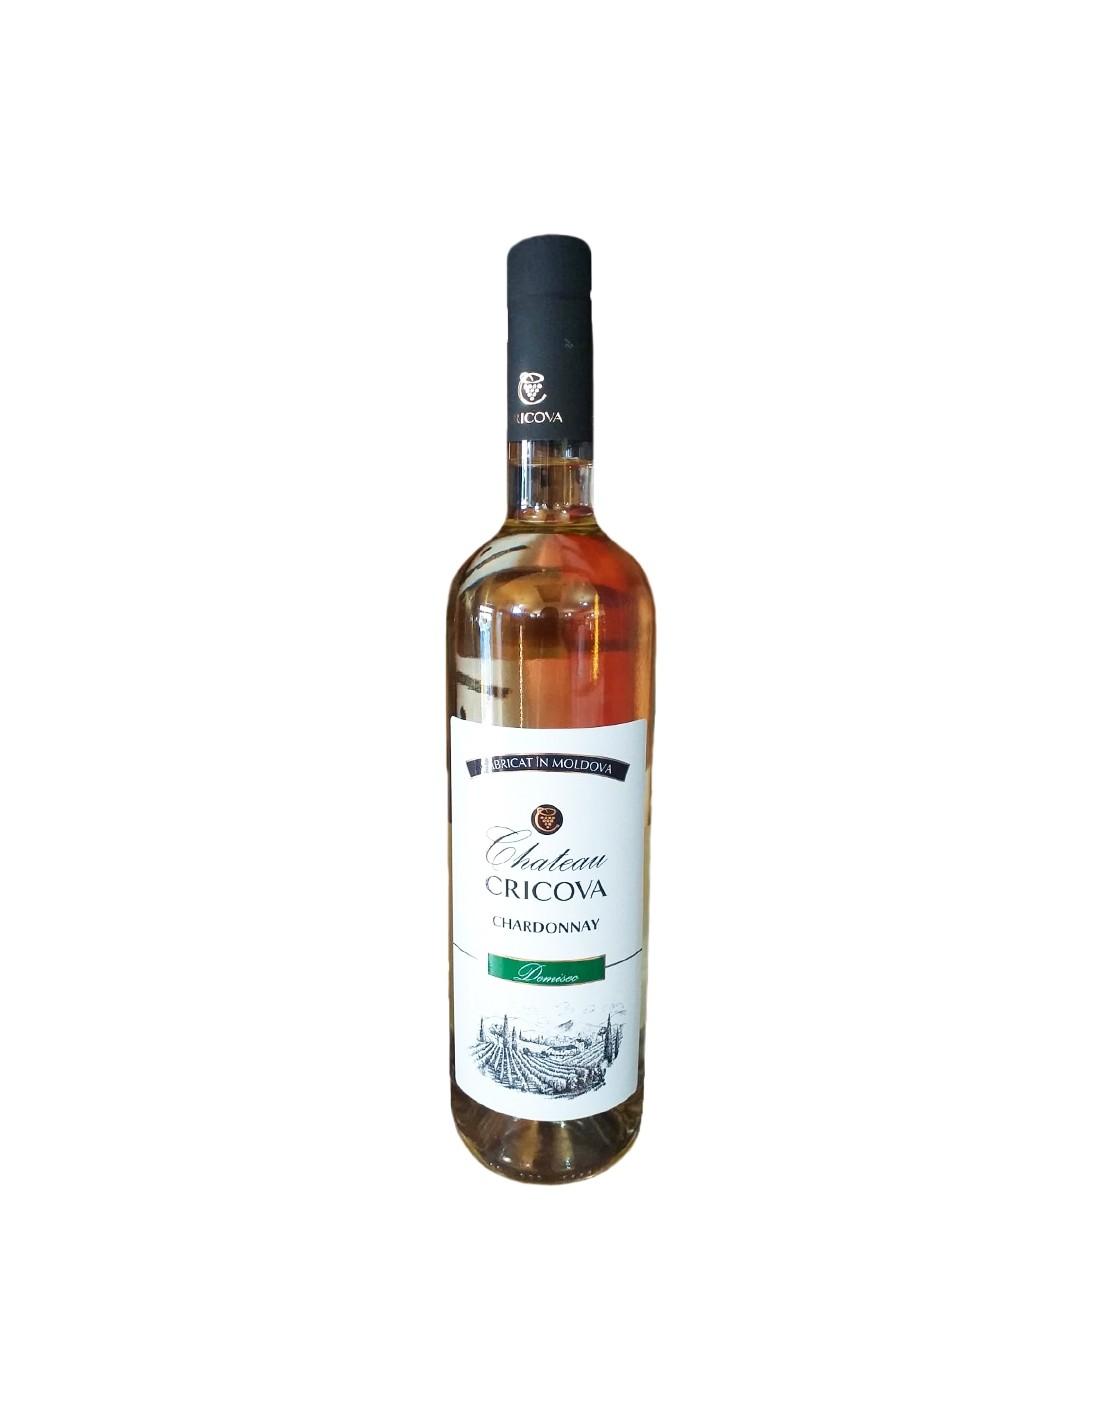 Vin alb demisec, Chardonnay, Château Cricova, 0.75L, 12% alc., Republica Moldova